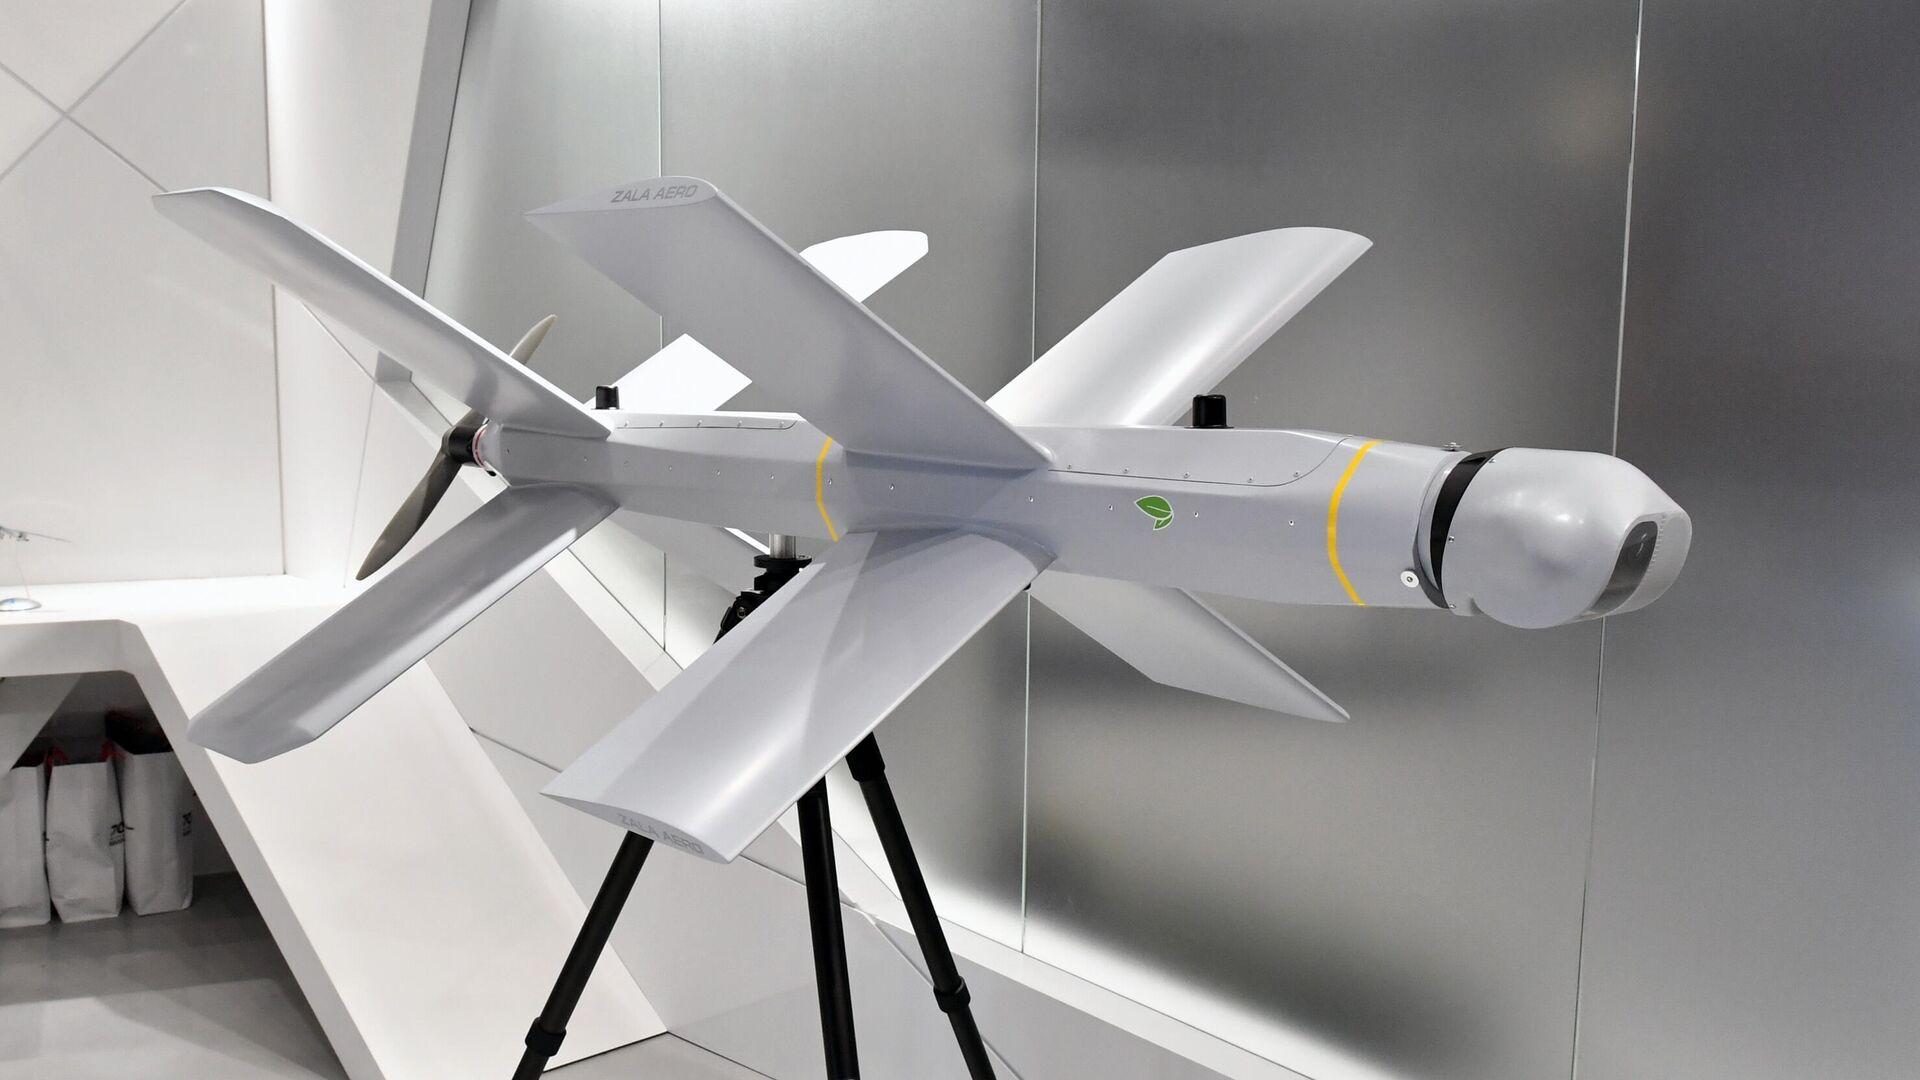 Dron kamikaze ruso Lancet - Sputnik Mundo, 1920, 18.04.2021